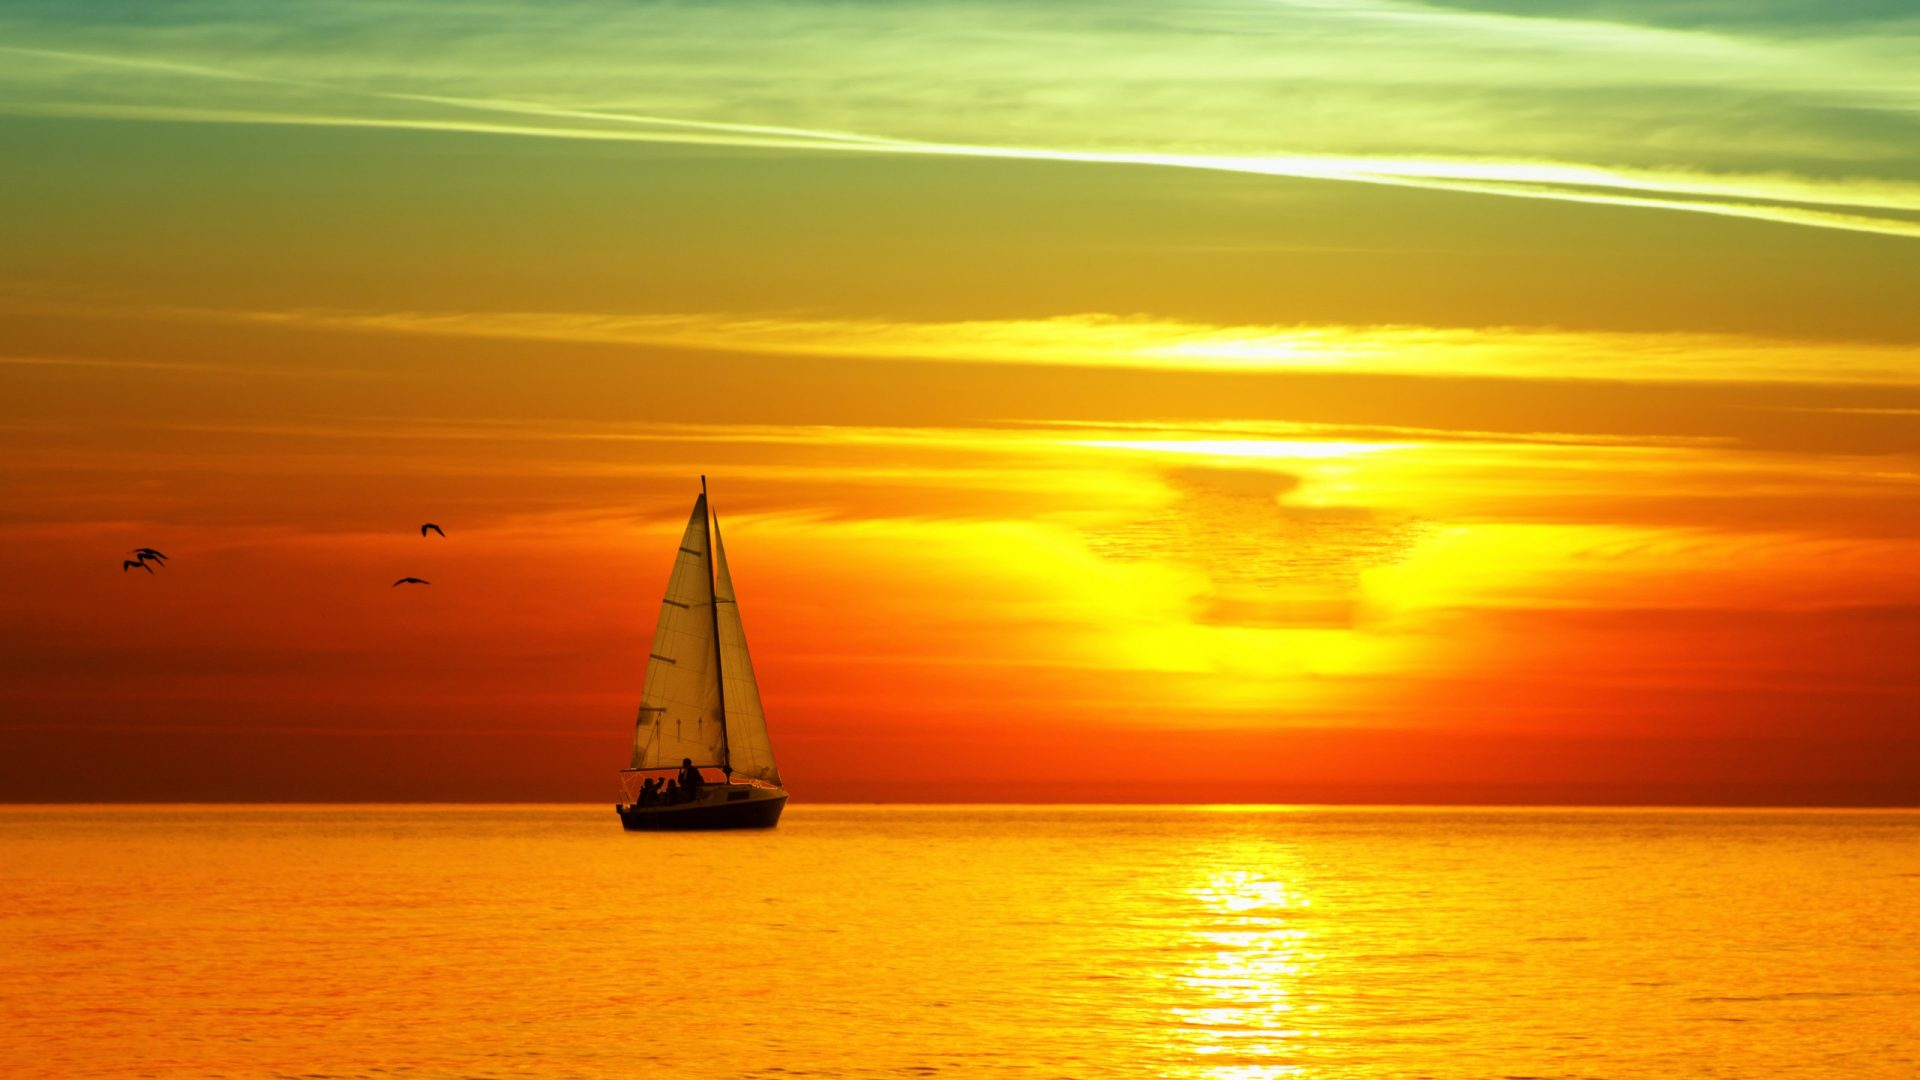 beaches-sailing-amber-brightness-multicolor-awesome-navigating-sailboat-birds-paisage-photography-pa-wallpaper-wp3603061